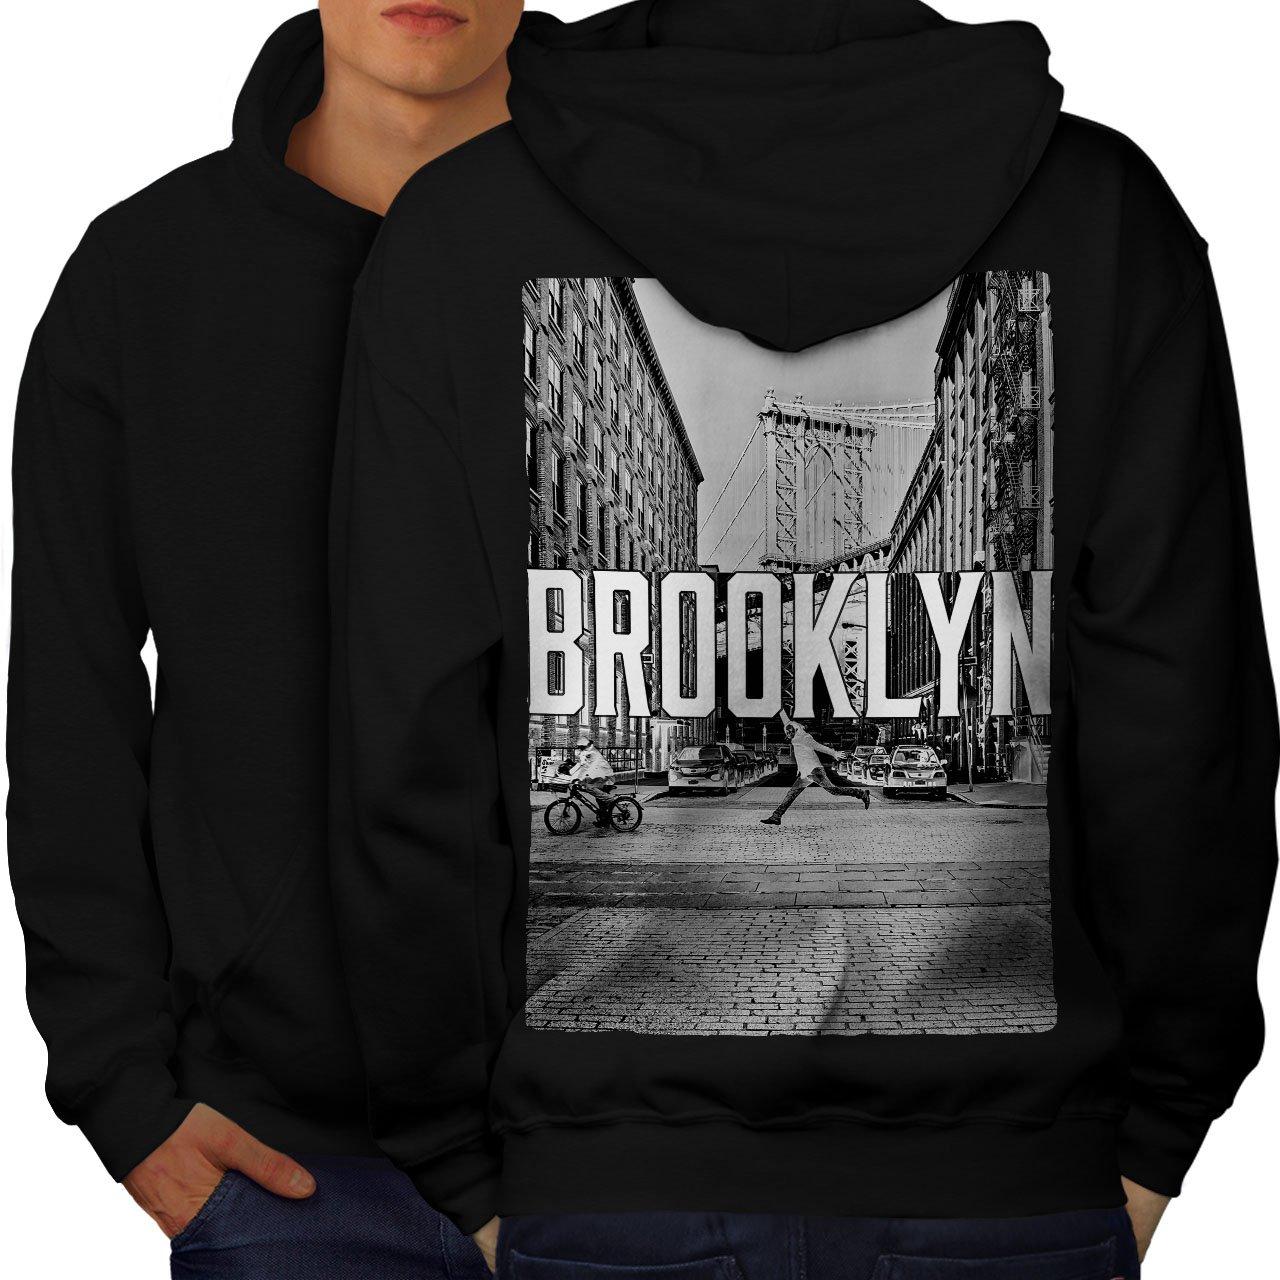 Wellcoda Brooklyn Urban Street Mens Hoodie, Grey City Design on the Jumpers Back